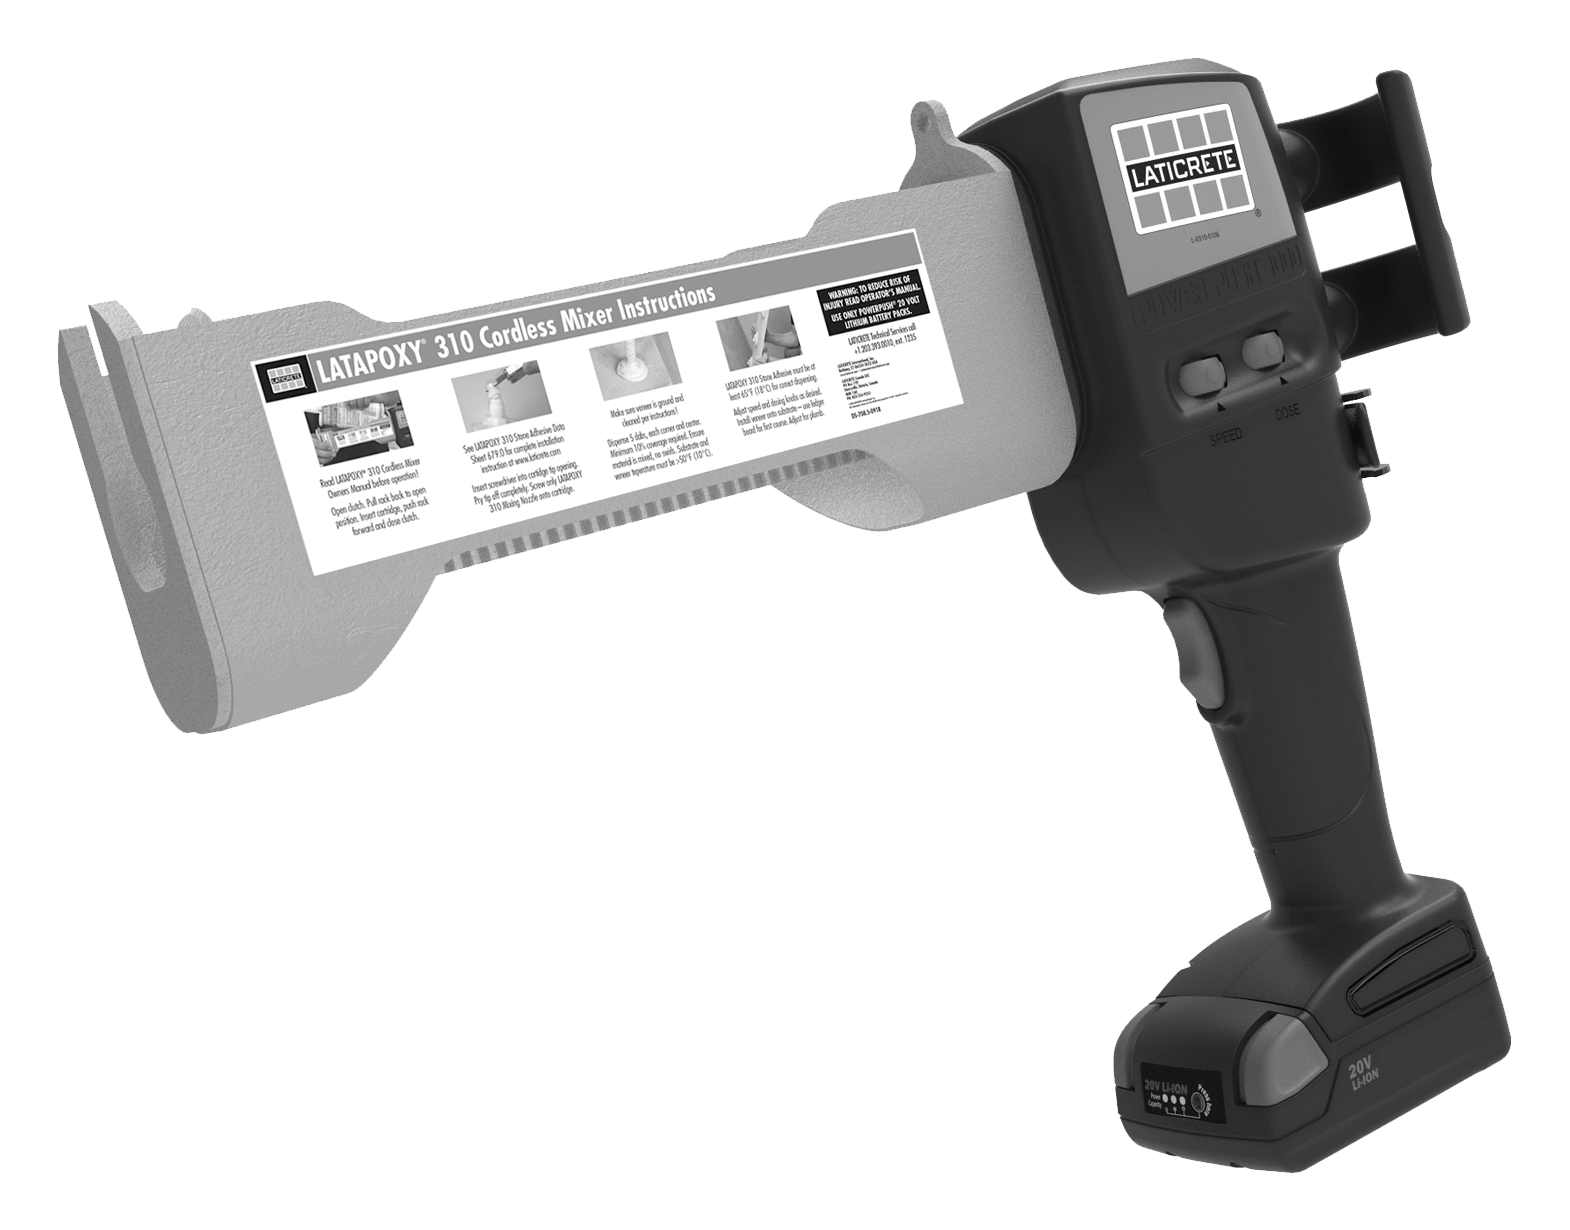 LATAPOXY® 310 Cordless Mixer